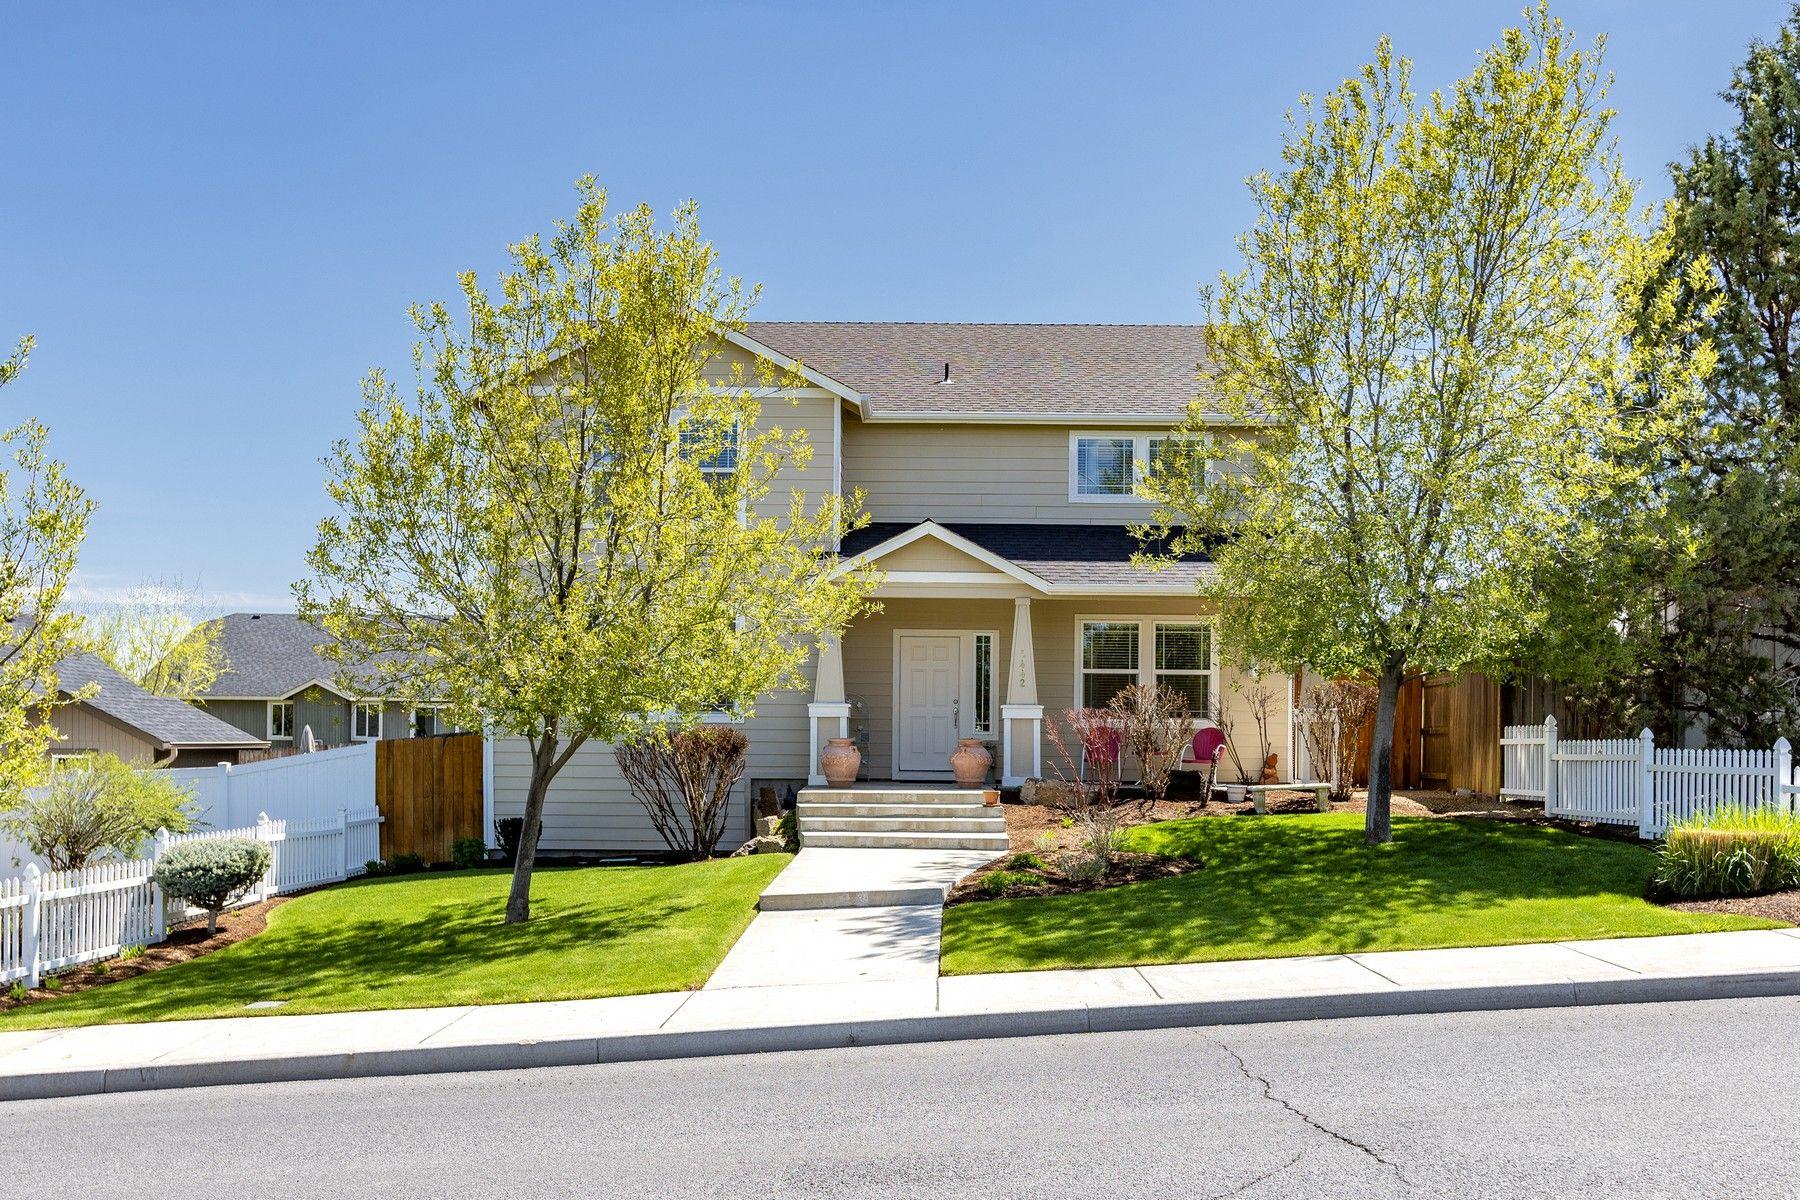 Other Residential Homes για την Πώληση στο 442 SW 35th Street Redmond, OR 97756 Redmond, Ορεγκον 97756 Ηνωμένες Πολιτείες